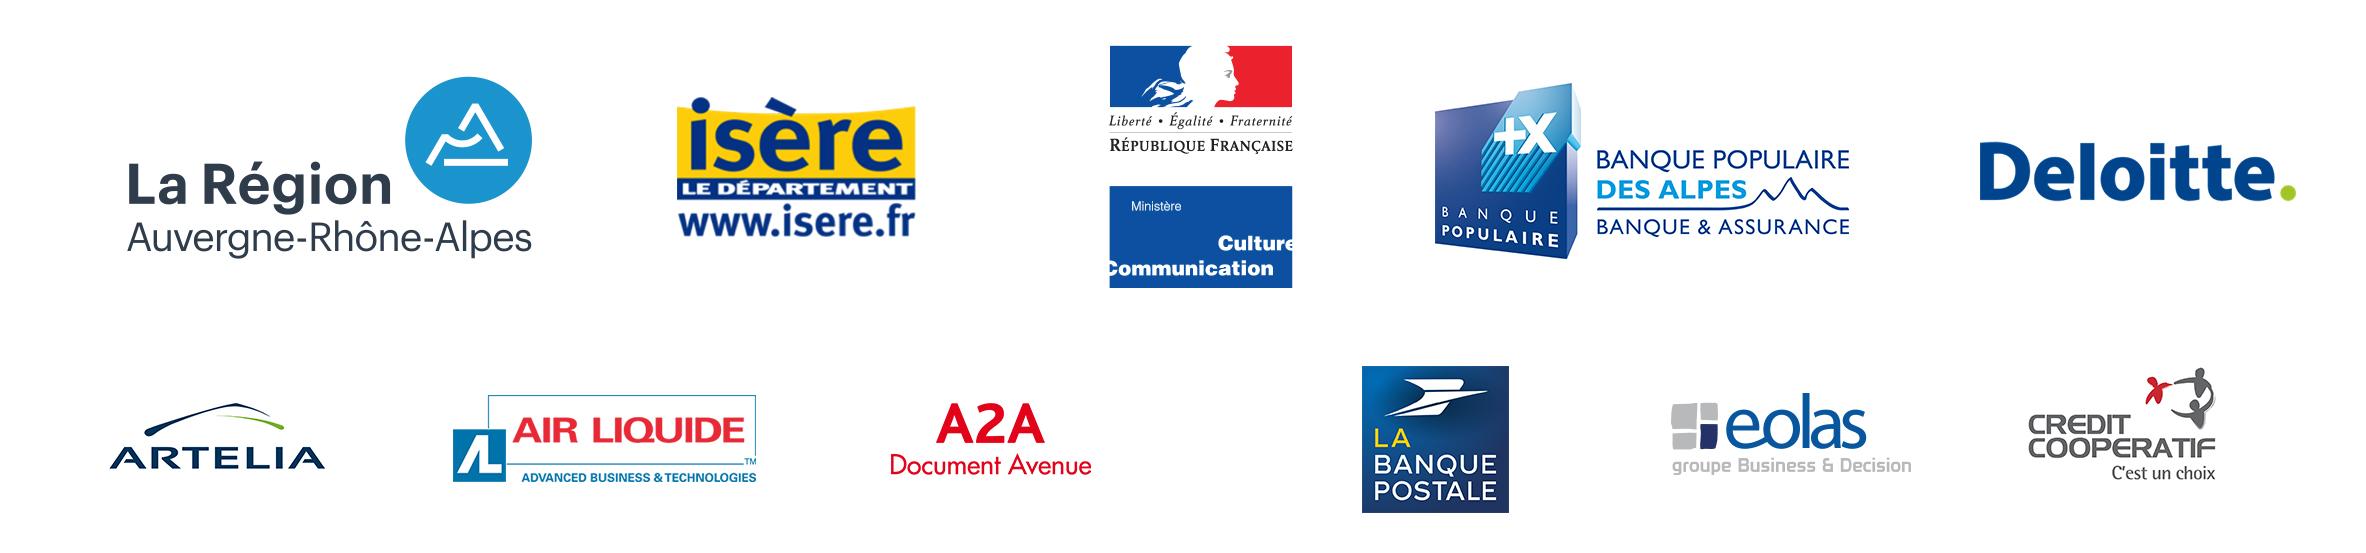 Microsoft Word - Logos partenaires - nov. 2015.docx